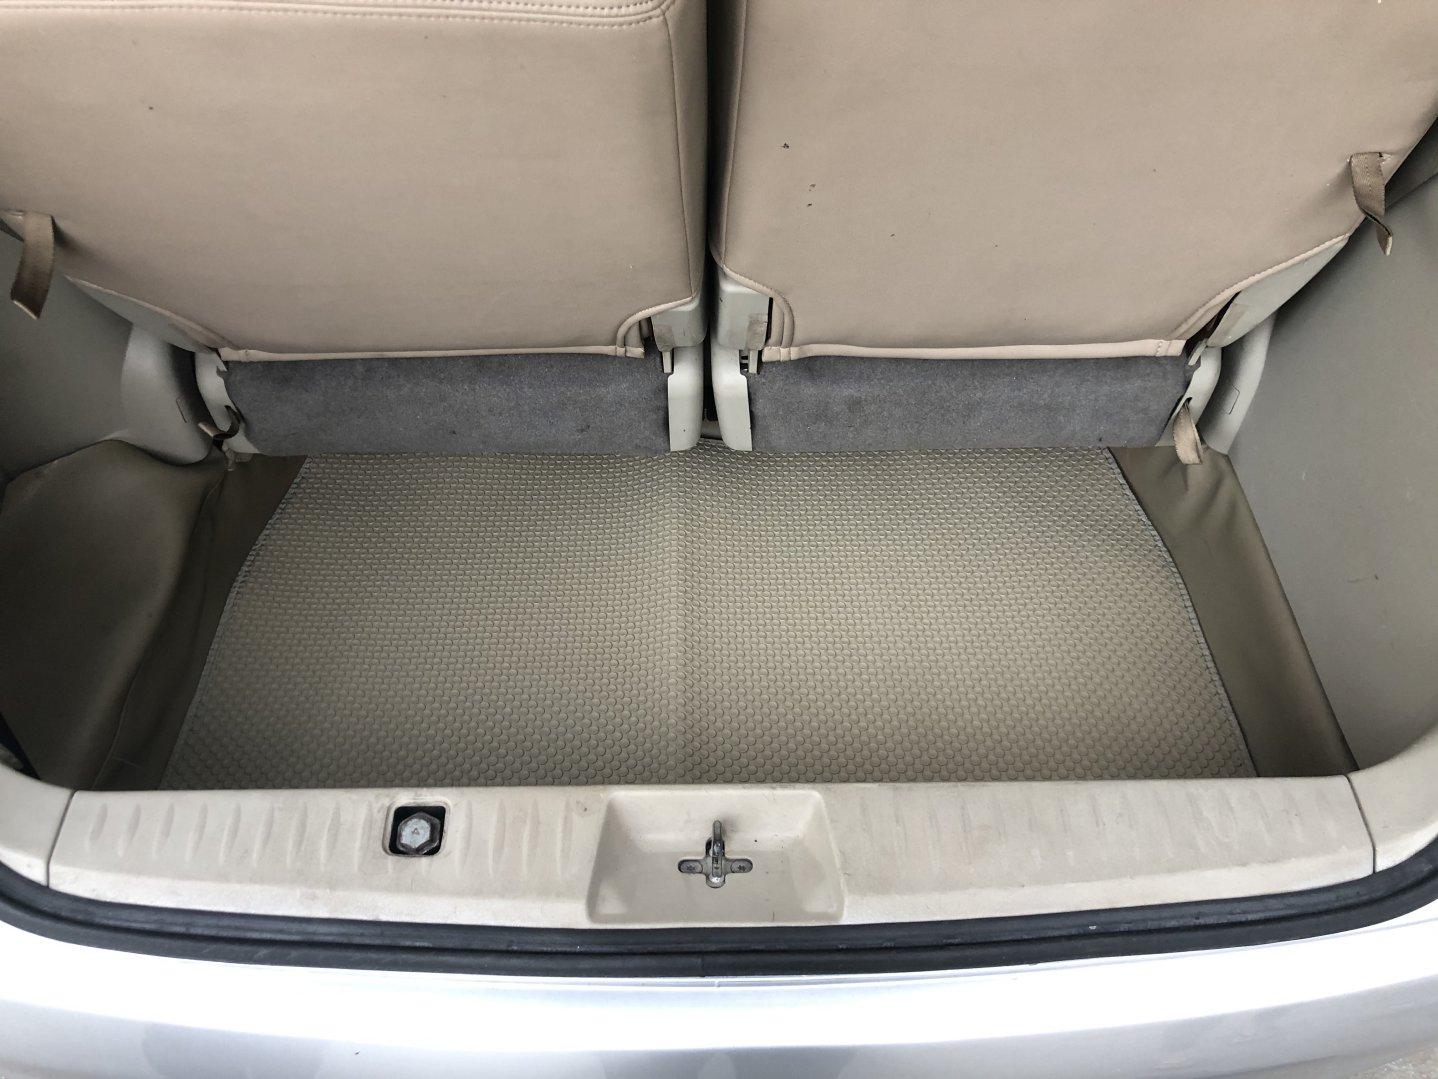 Thảm lót cốp Mitsubishi Grandis